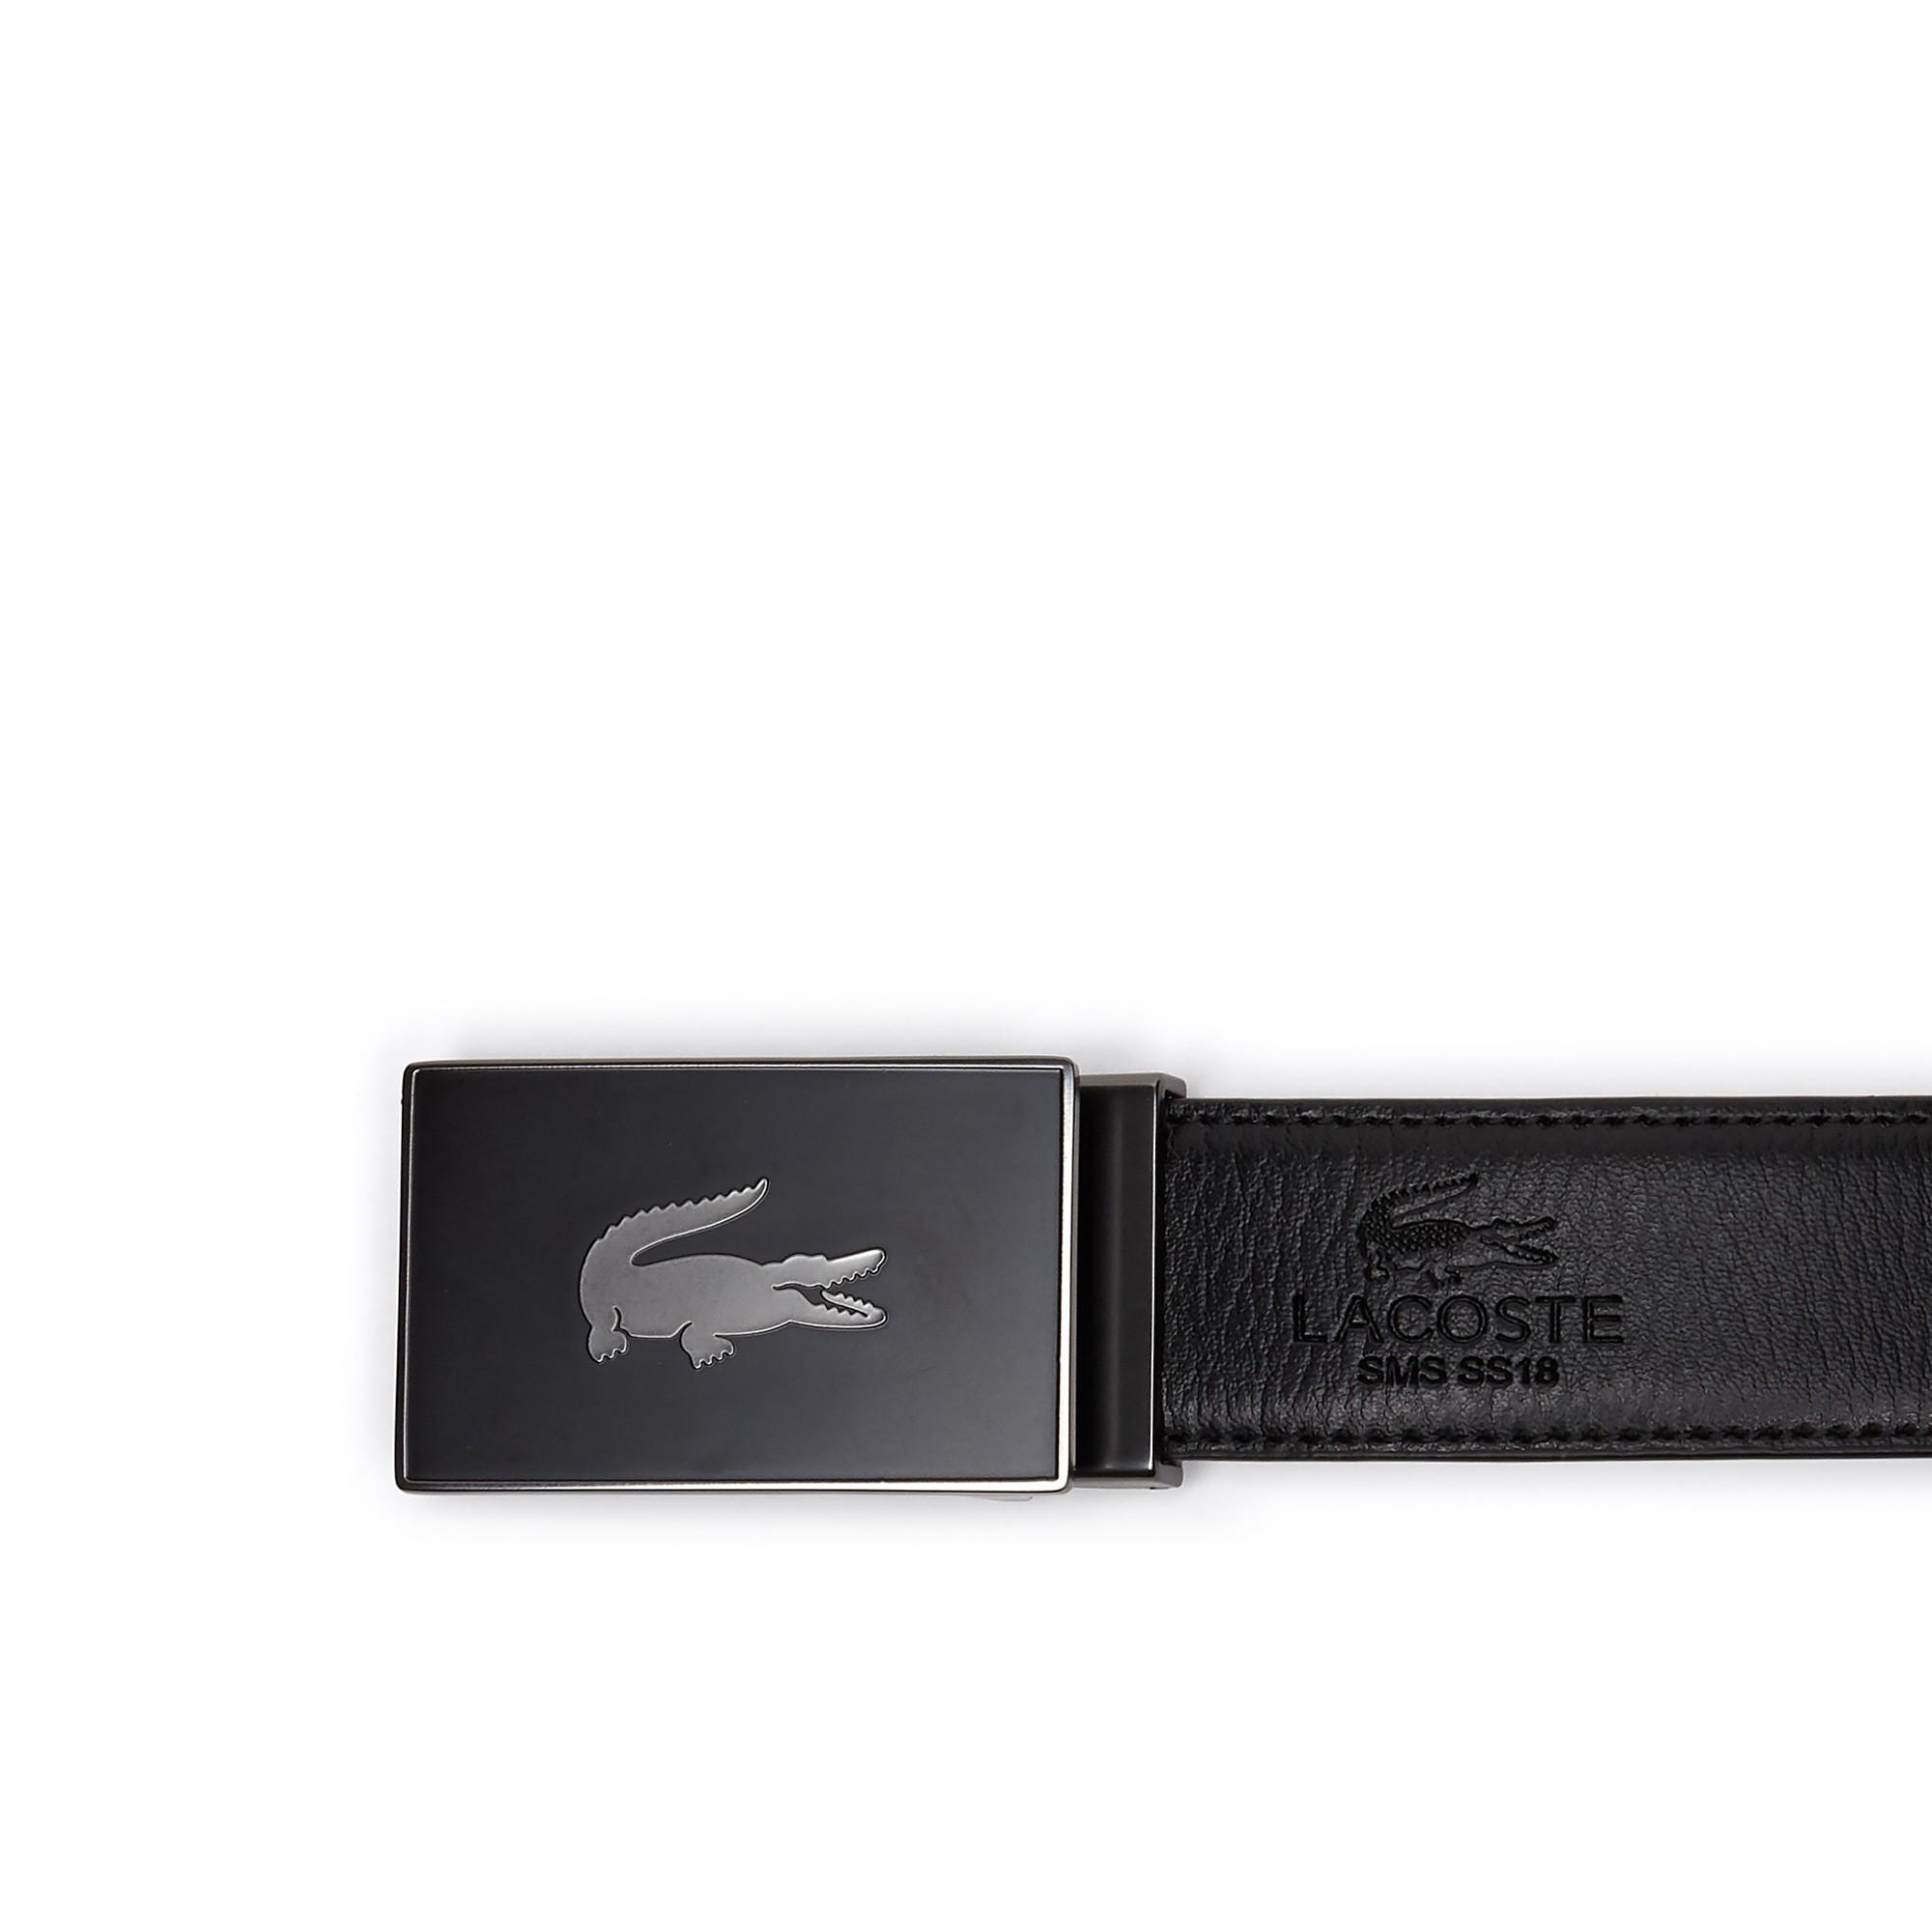 47af4ba8 Lacoste Men's Reversible Leather Belt And Two Buckles Gift Set ...